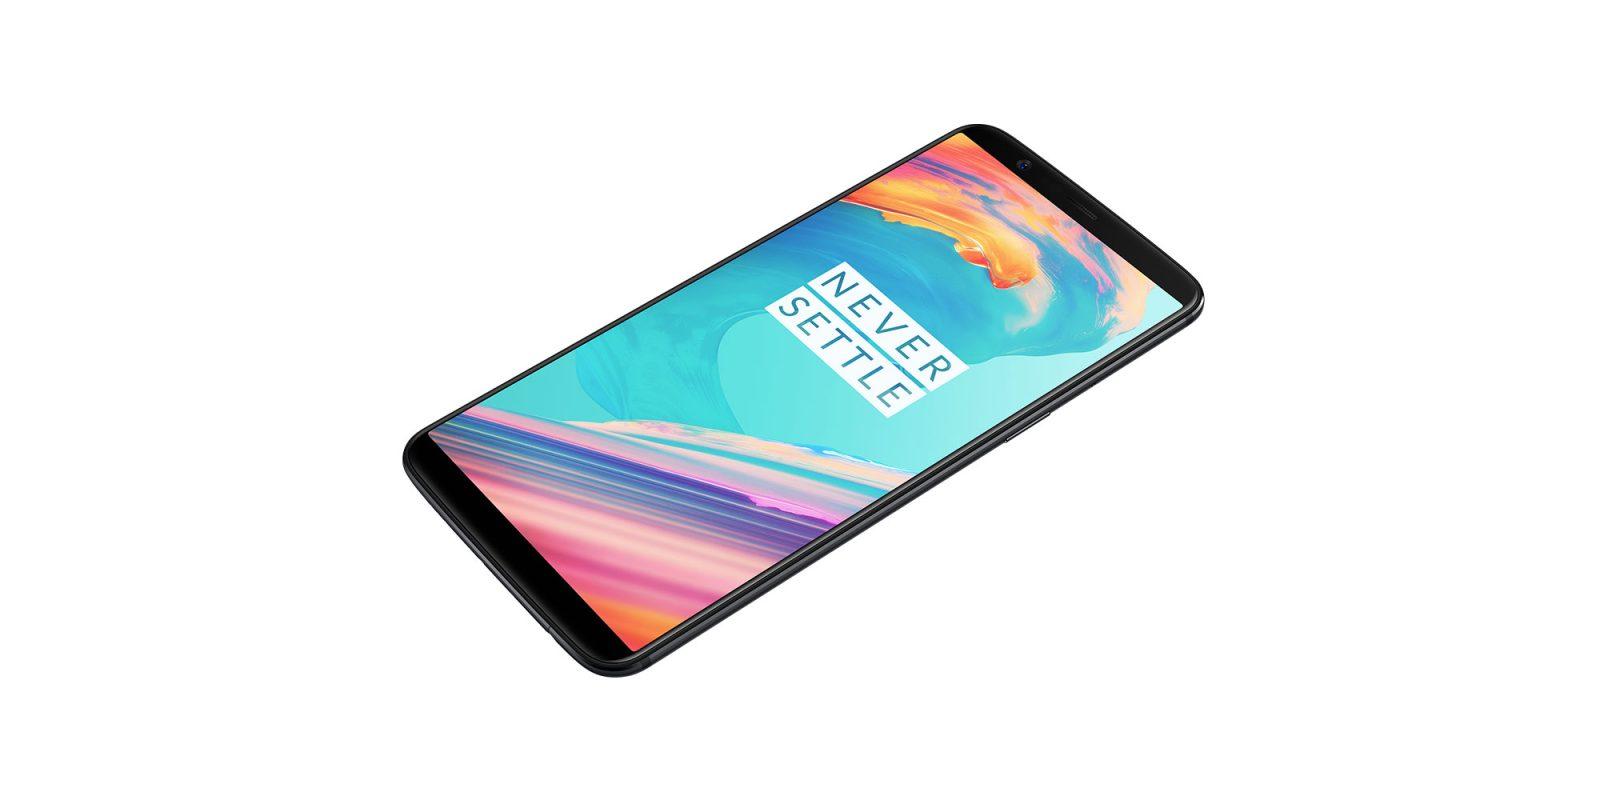 OnePlus 5T Flash Sale On Amazon